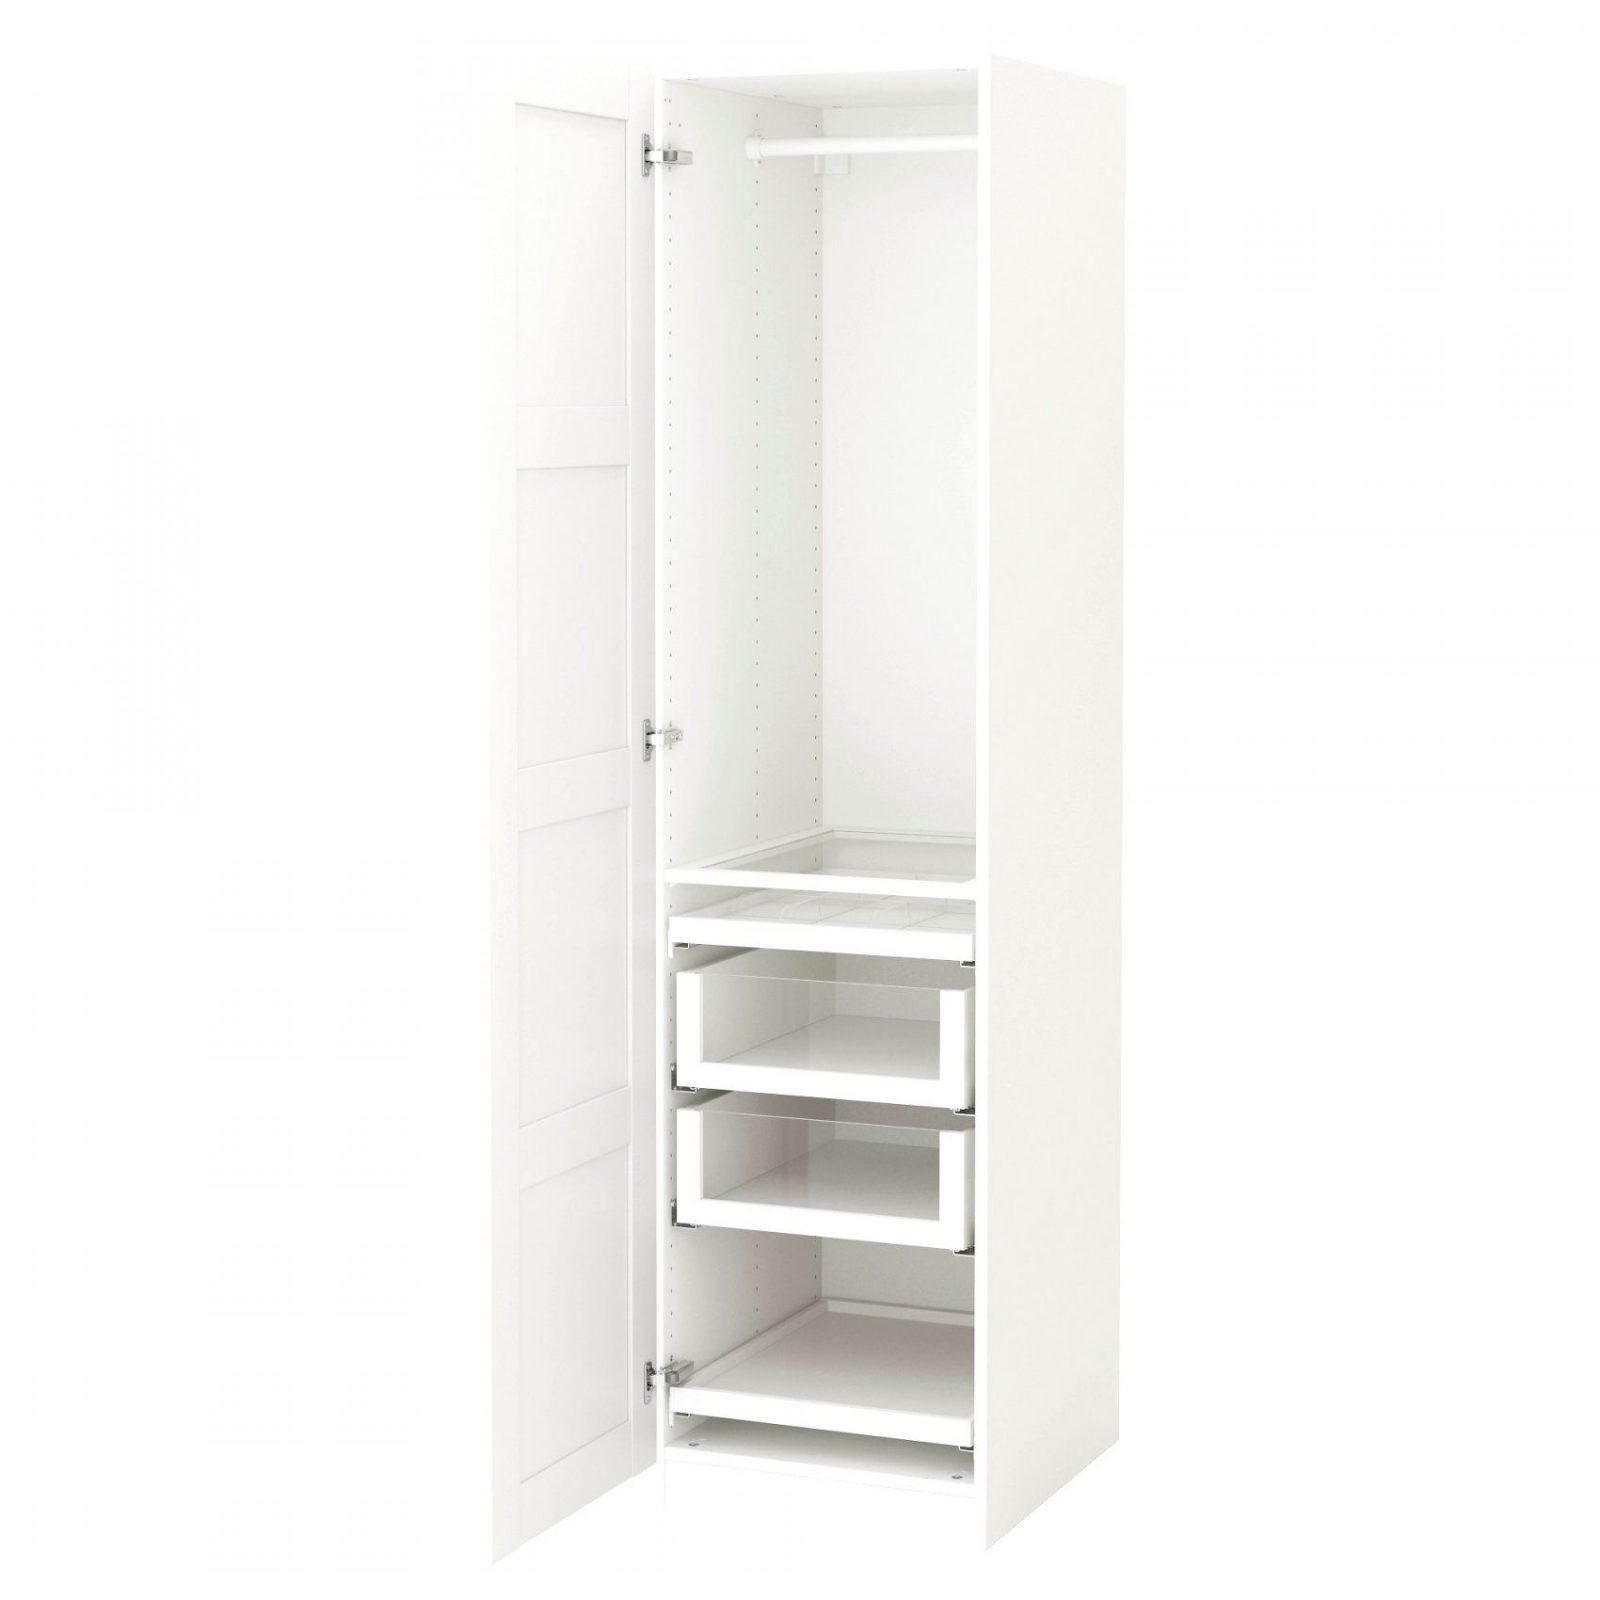 Ikea Keukenkast 50 Cm Breed In Amazing Galerij Van Pax Systeem von Spülenunterschrank 50 Cm Ikea Photo